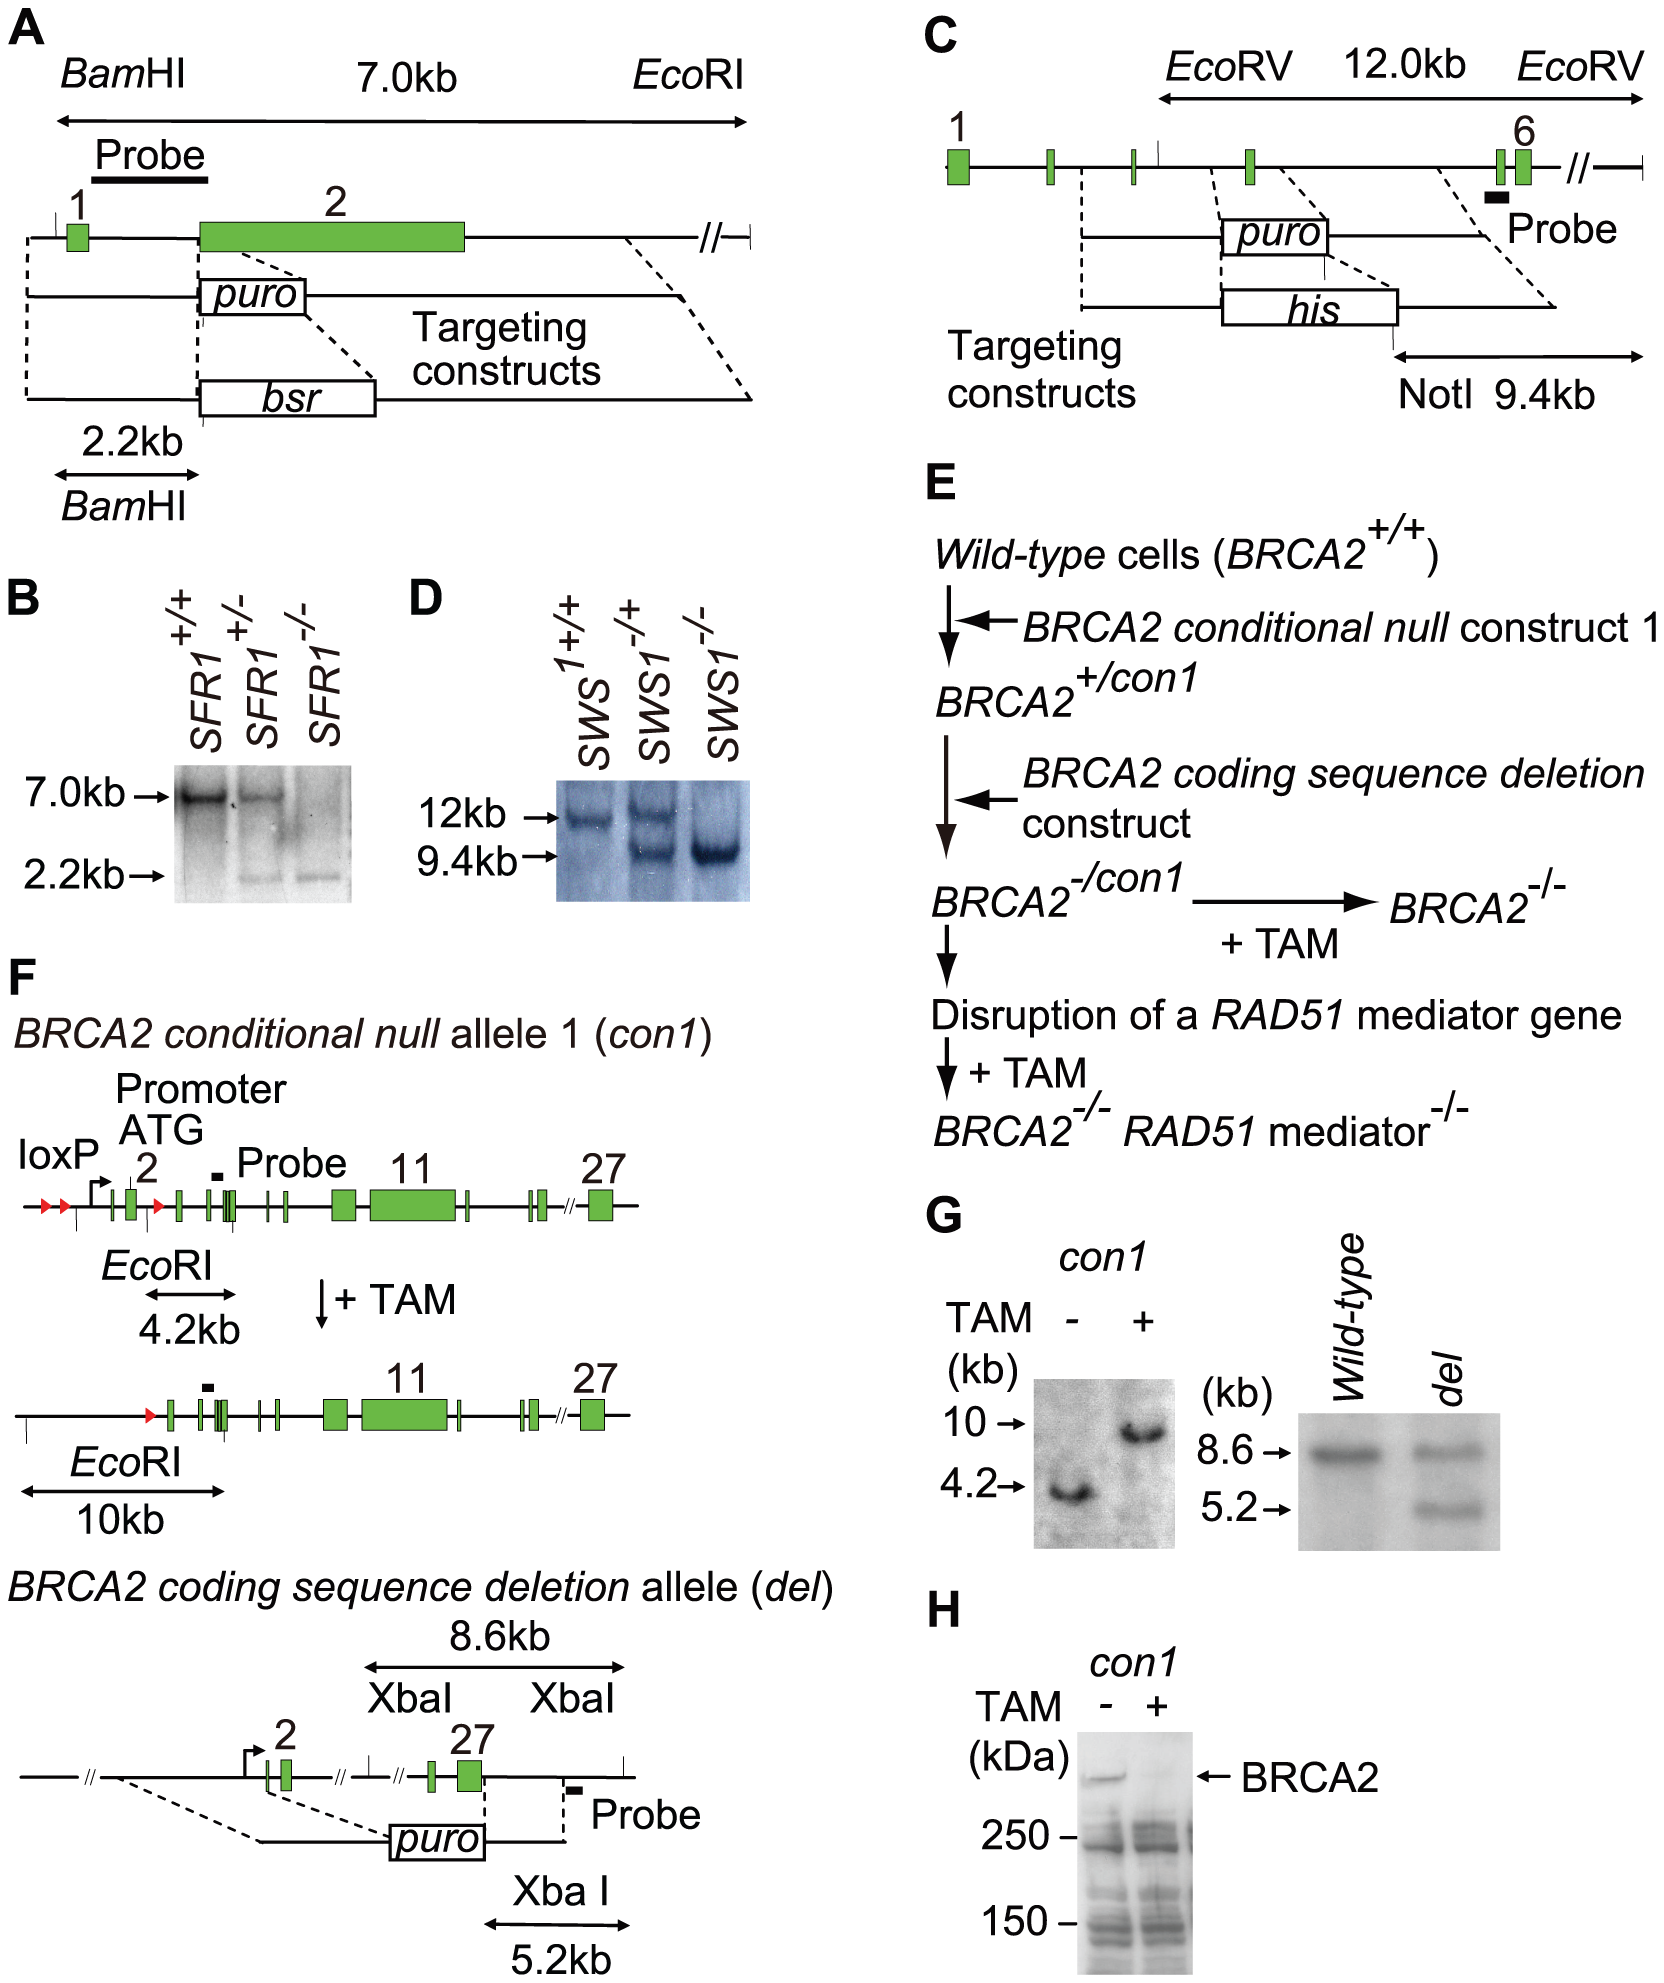 Gene disruption of the <i>SFR1</i>, <i>SWS1</i>, and <i>BRCA2</i> loci.